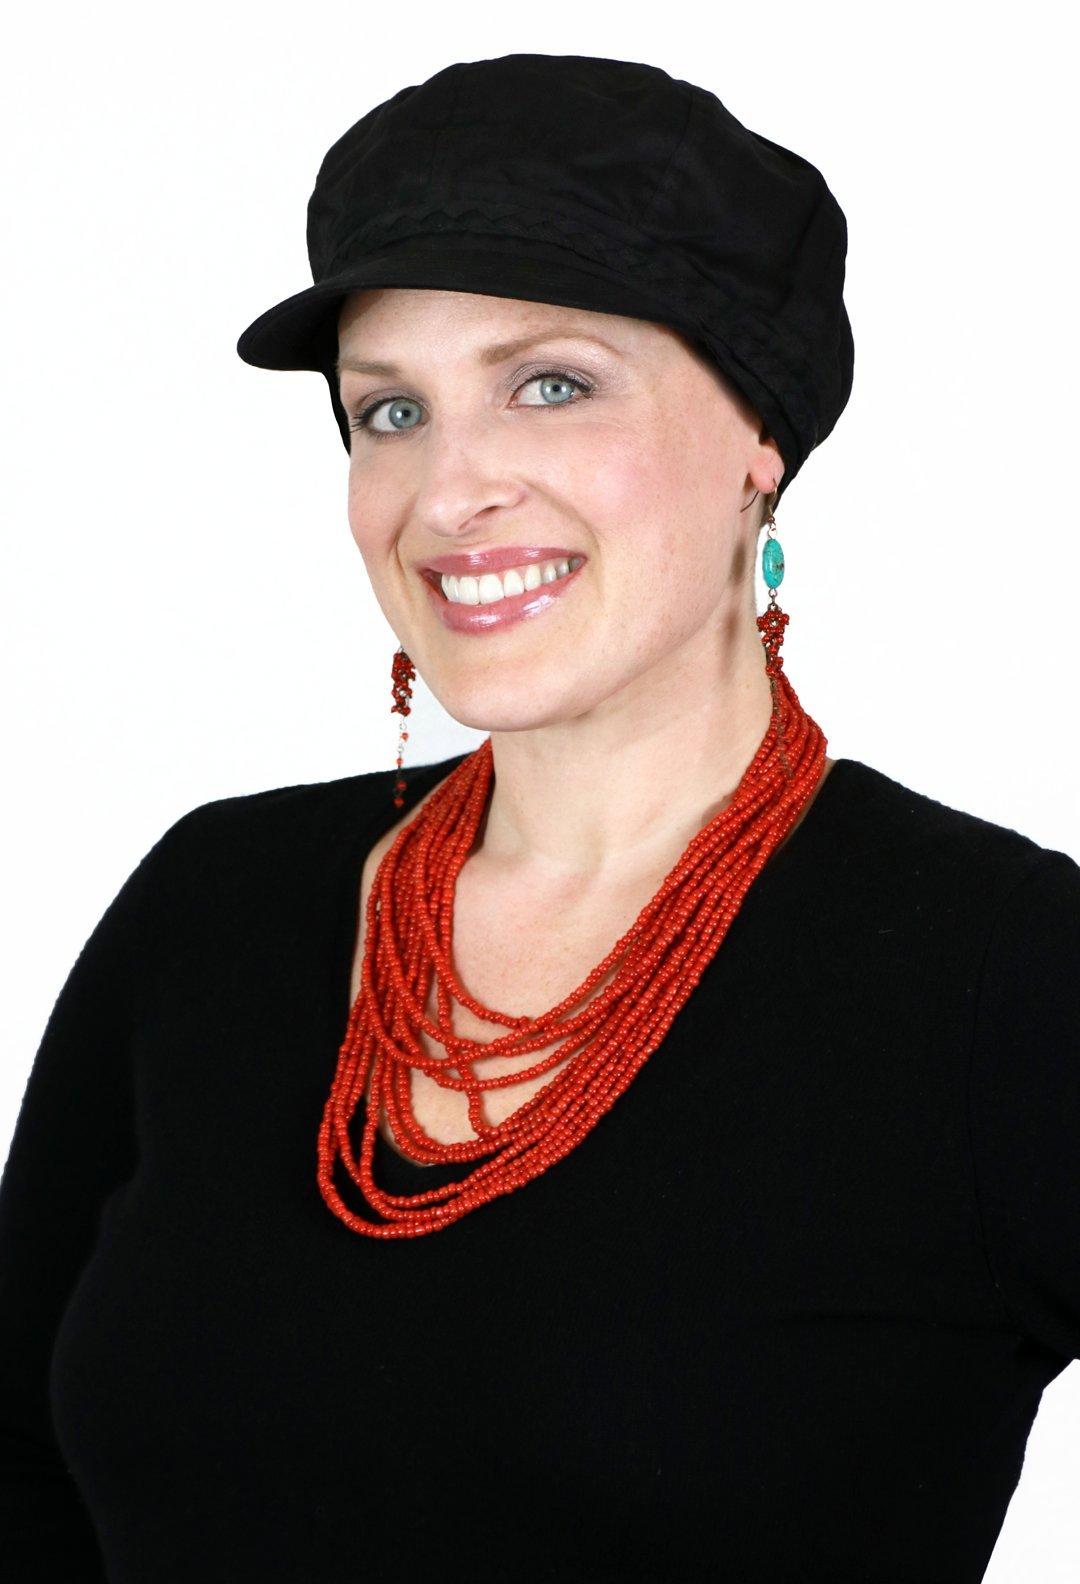 Summer Cotton Newsboy Cap Hats for Cancer Patients Women (Black)